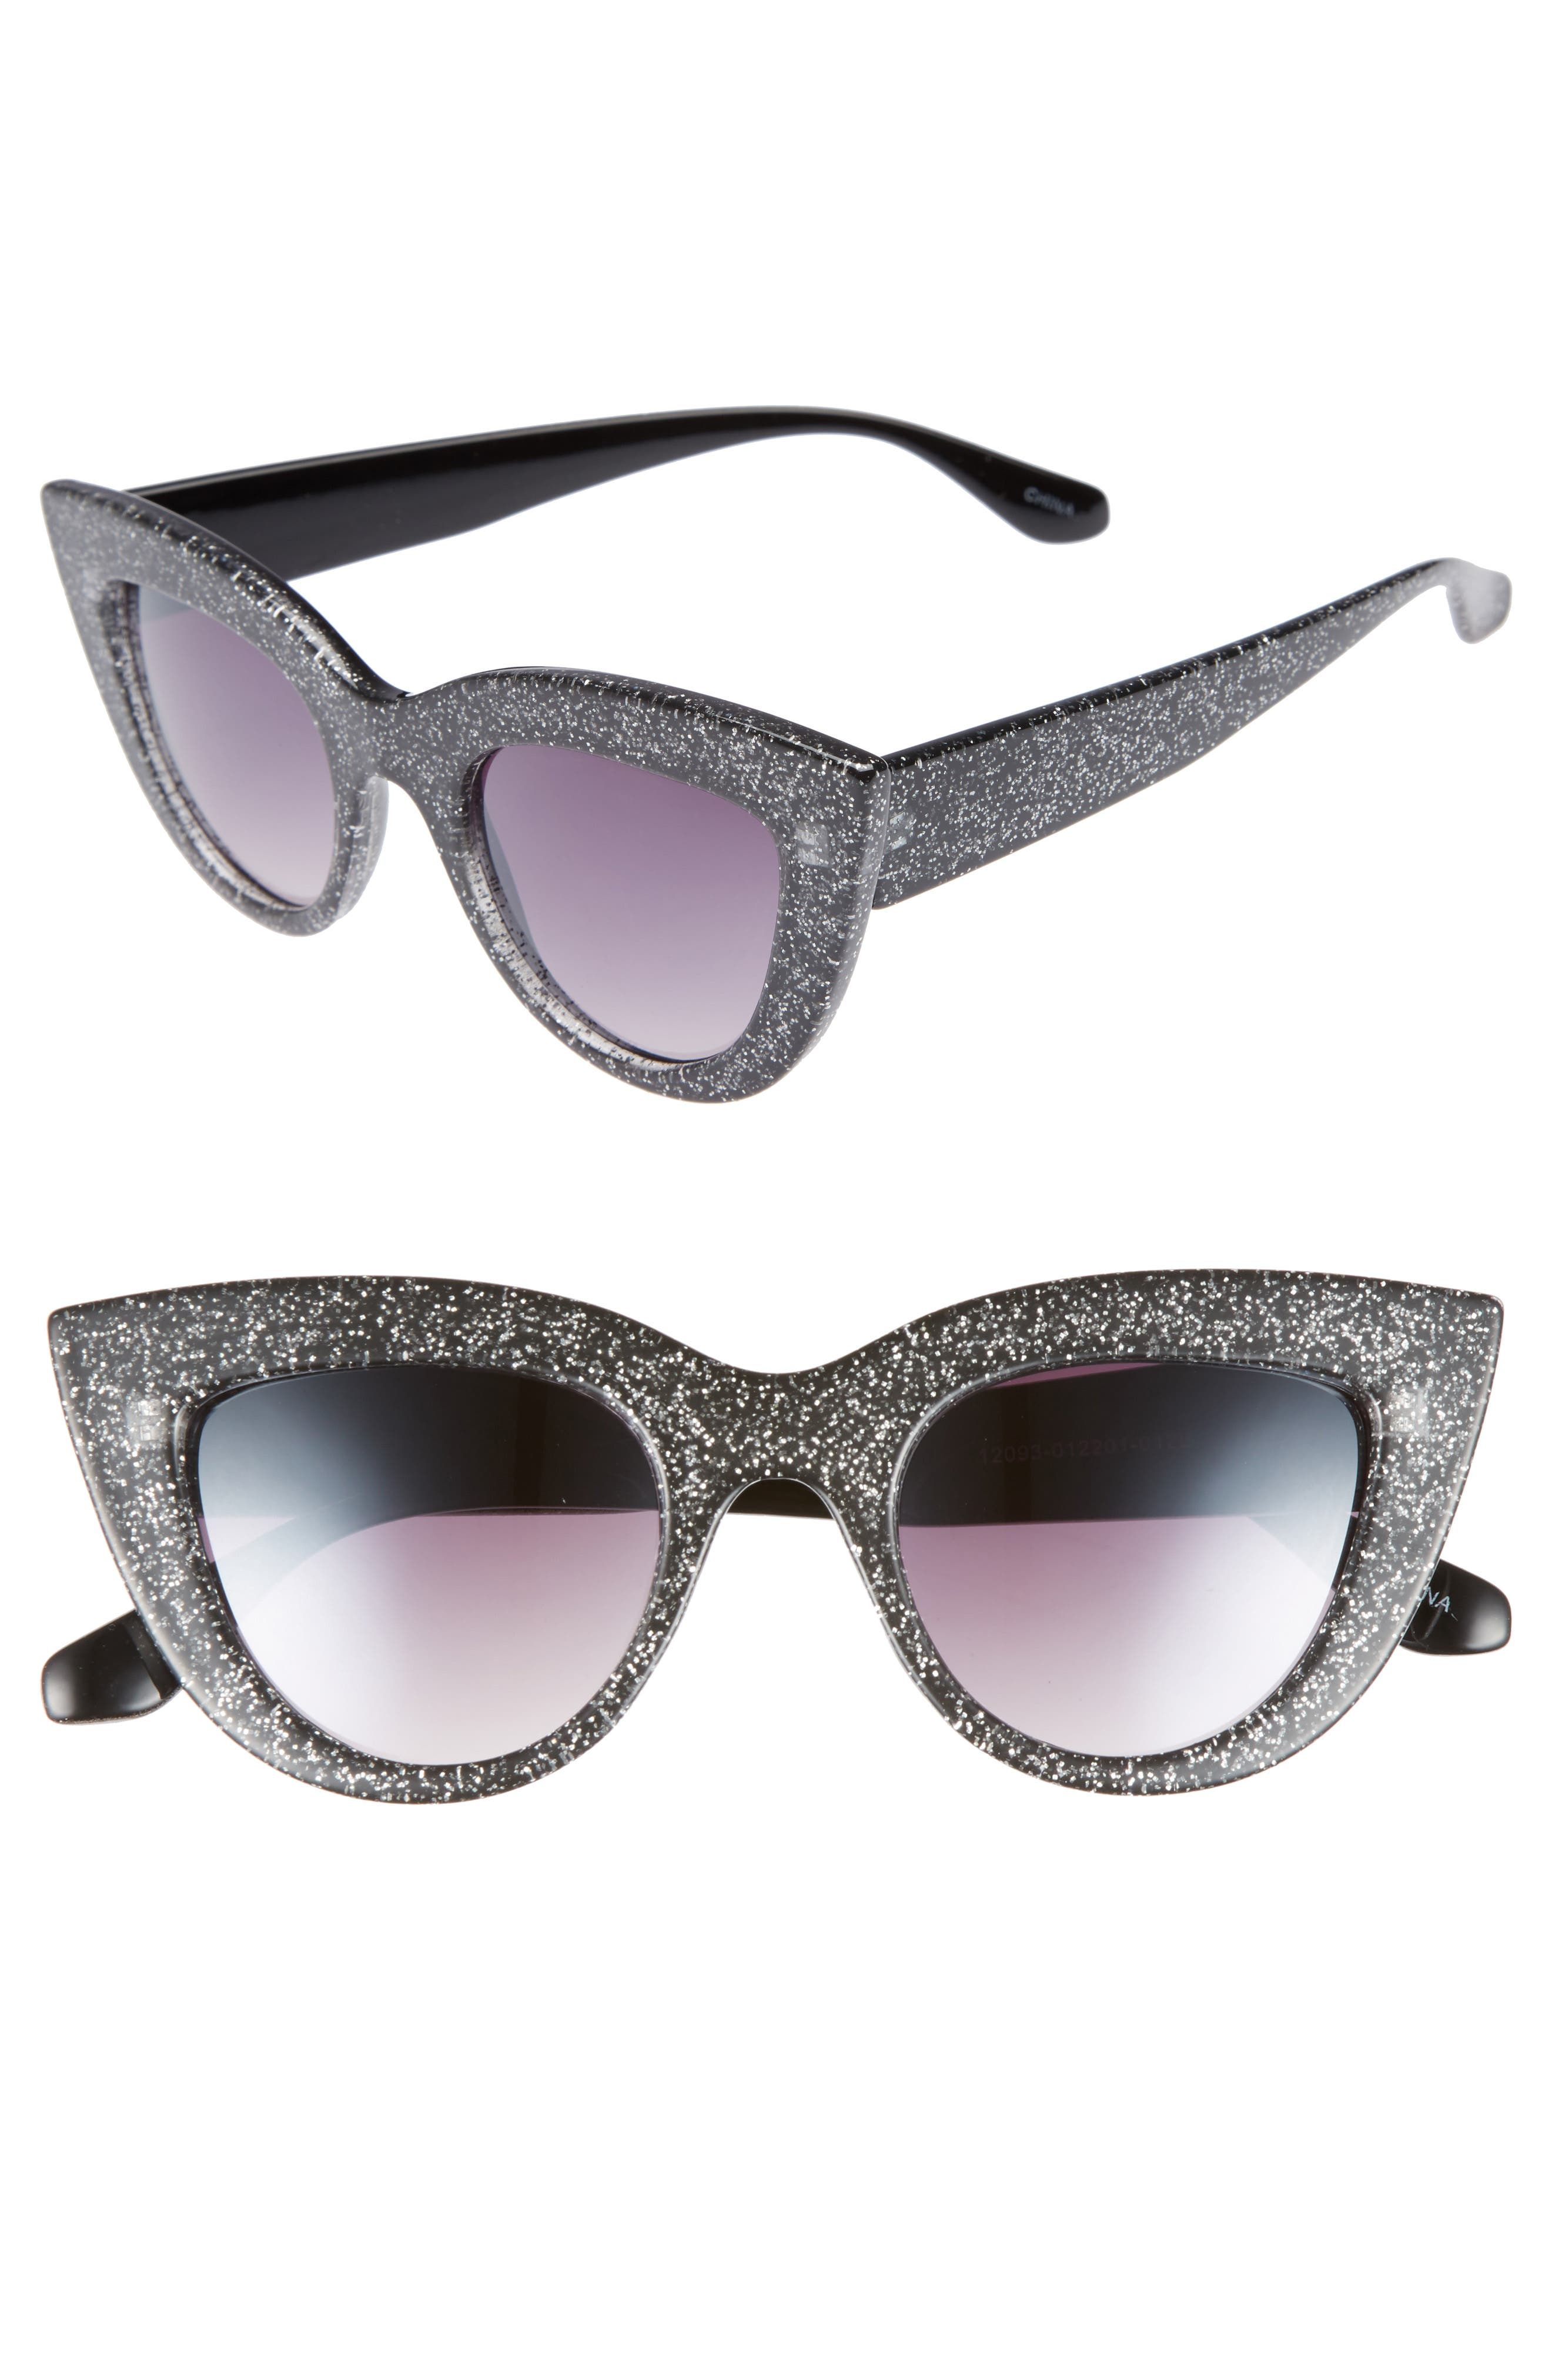 45mm Glitter Cat Eye Sunglasses,                         Main,                         color,